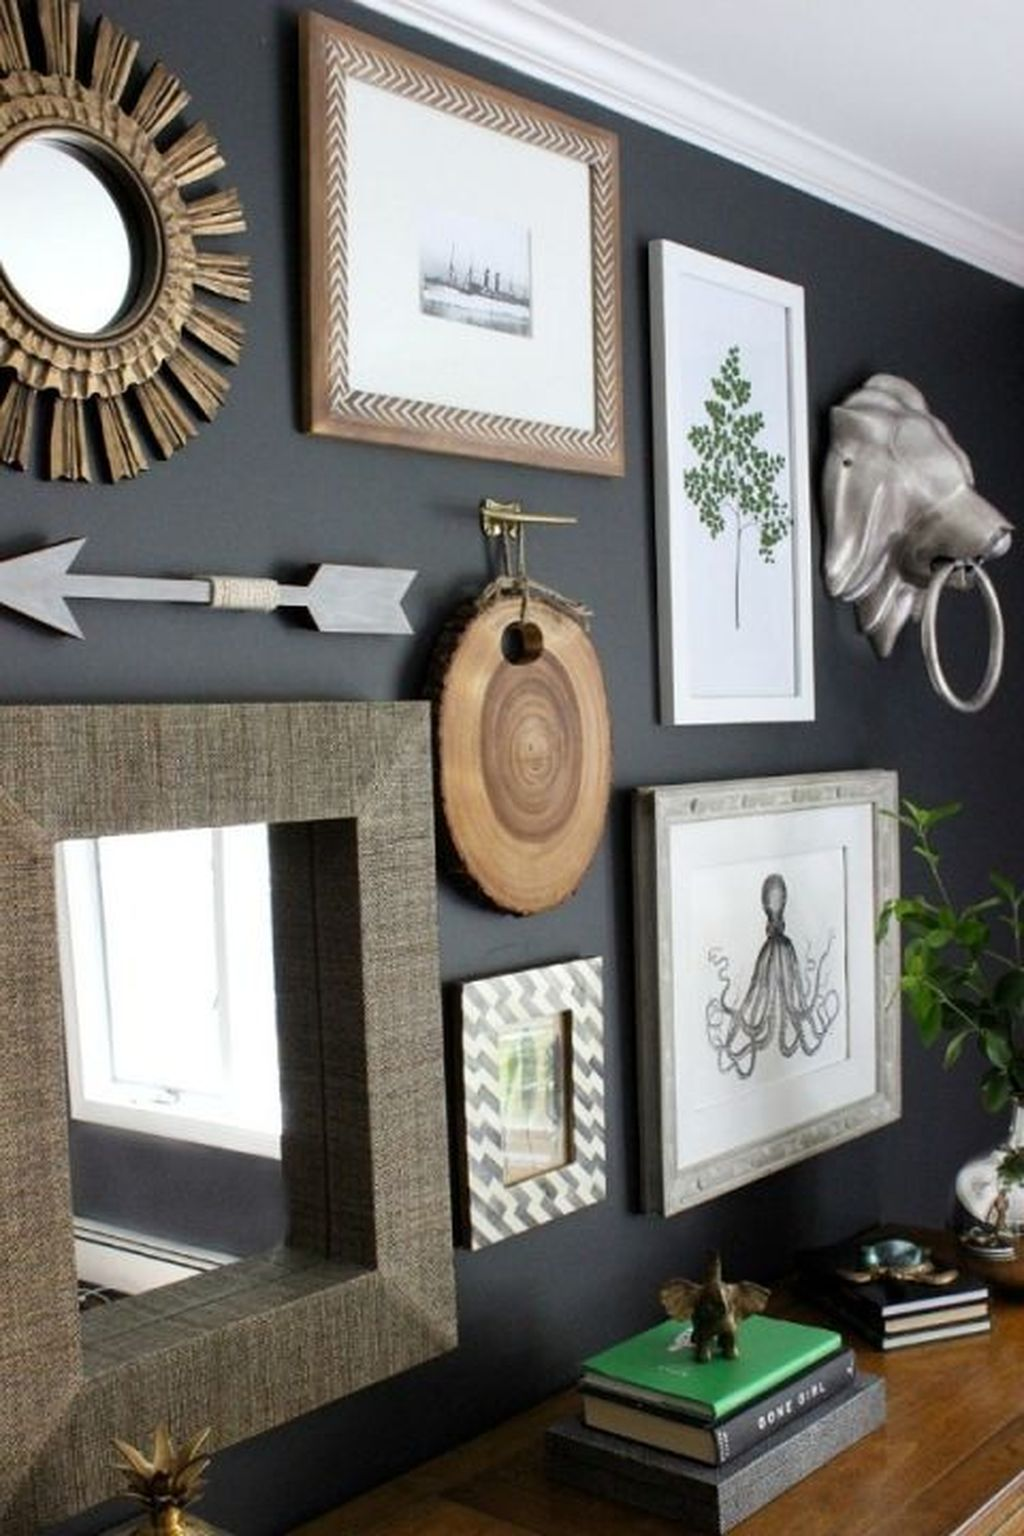 The Best Office Artwork Design Ideas 08